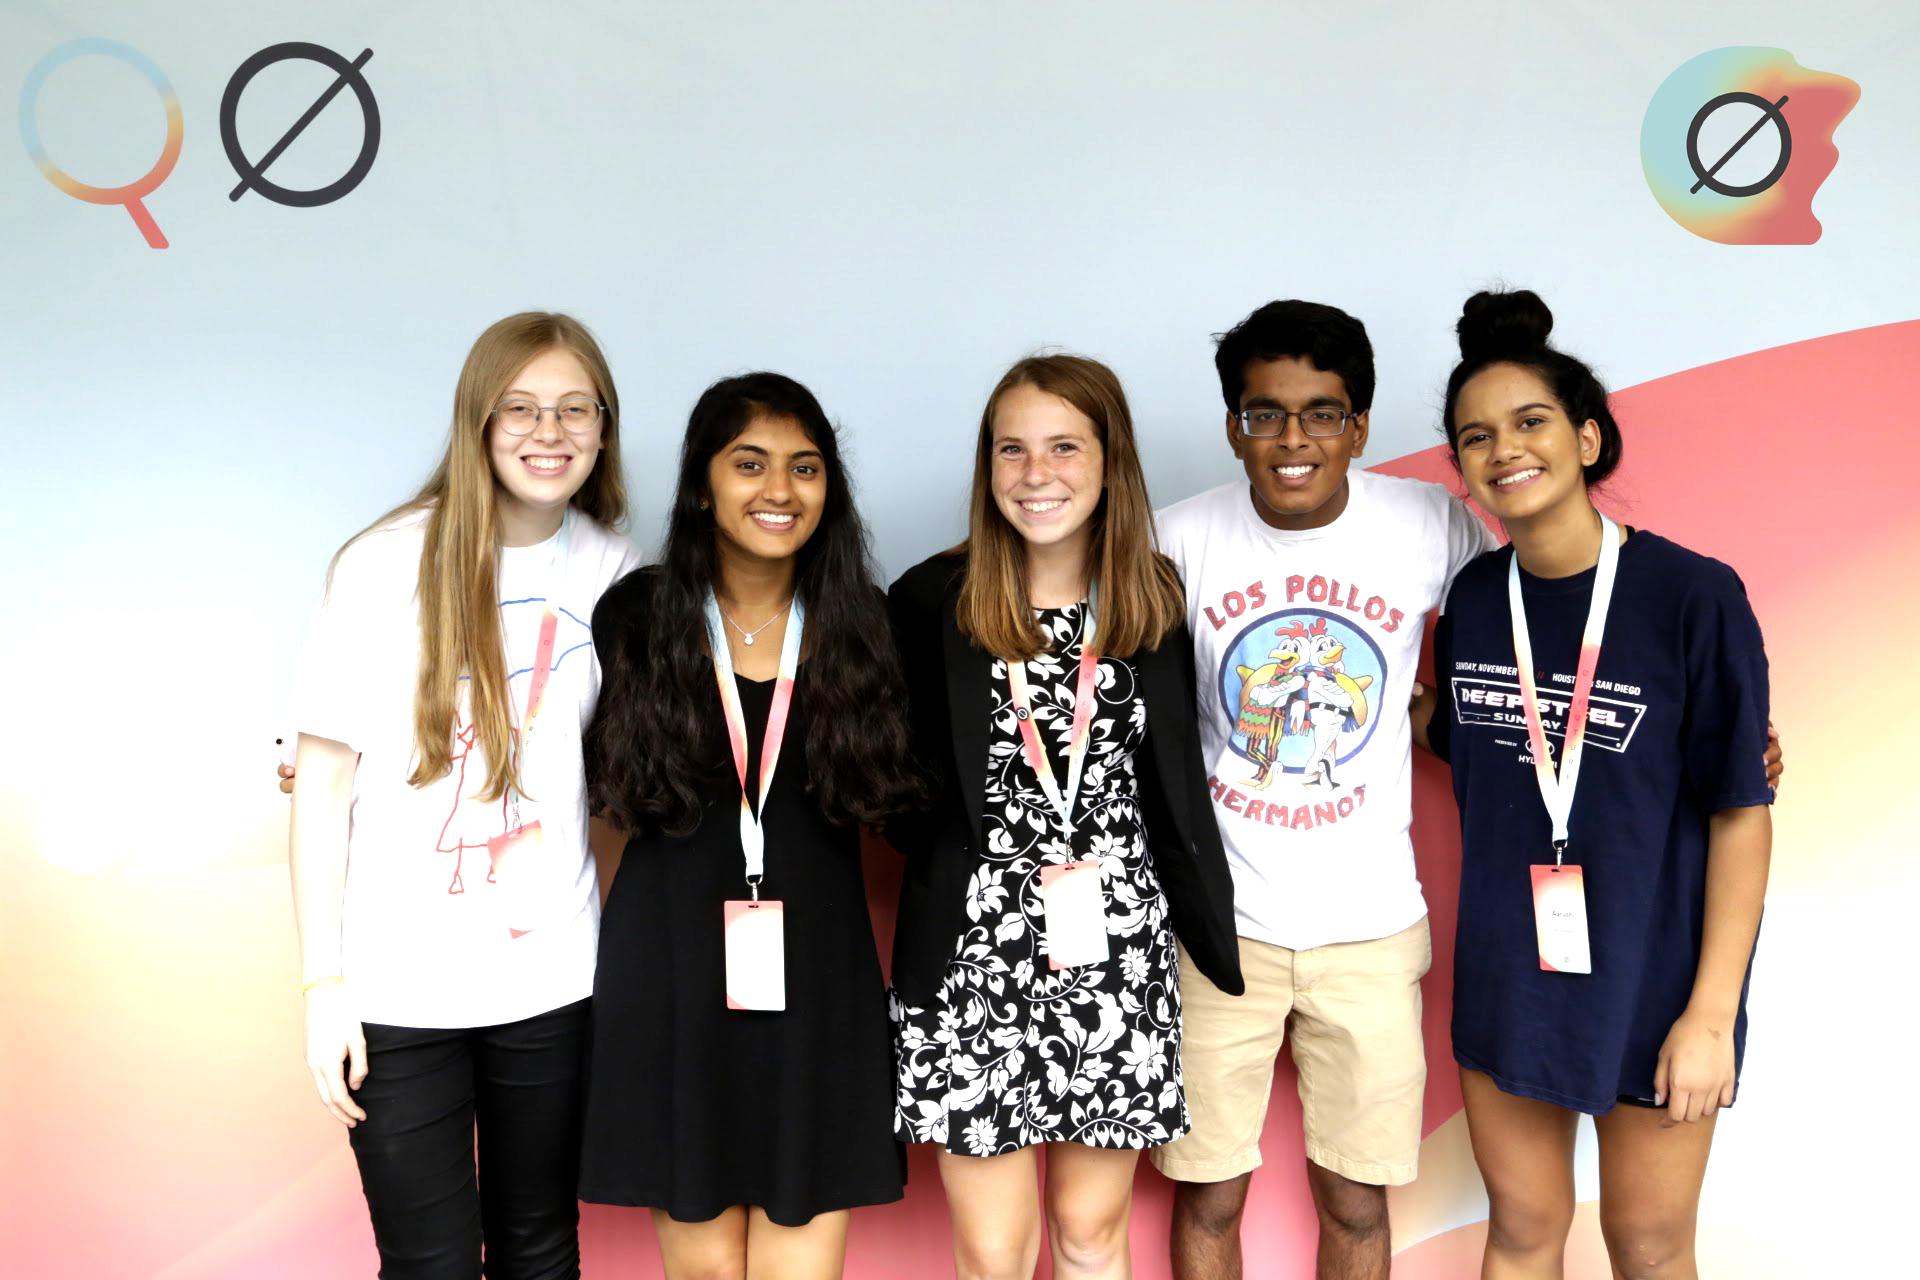 Summer Program - Invention | Startup Experiences This Summer - Quarter Zero